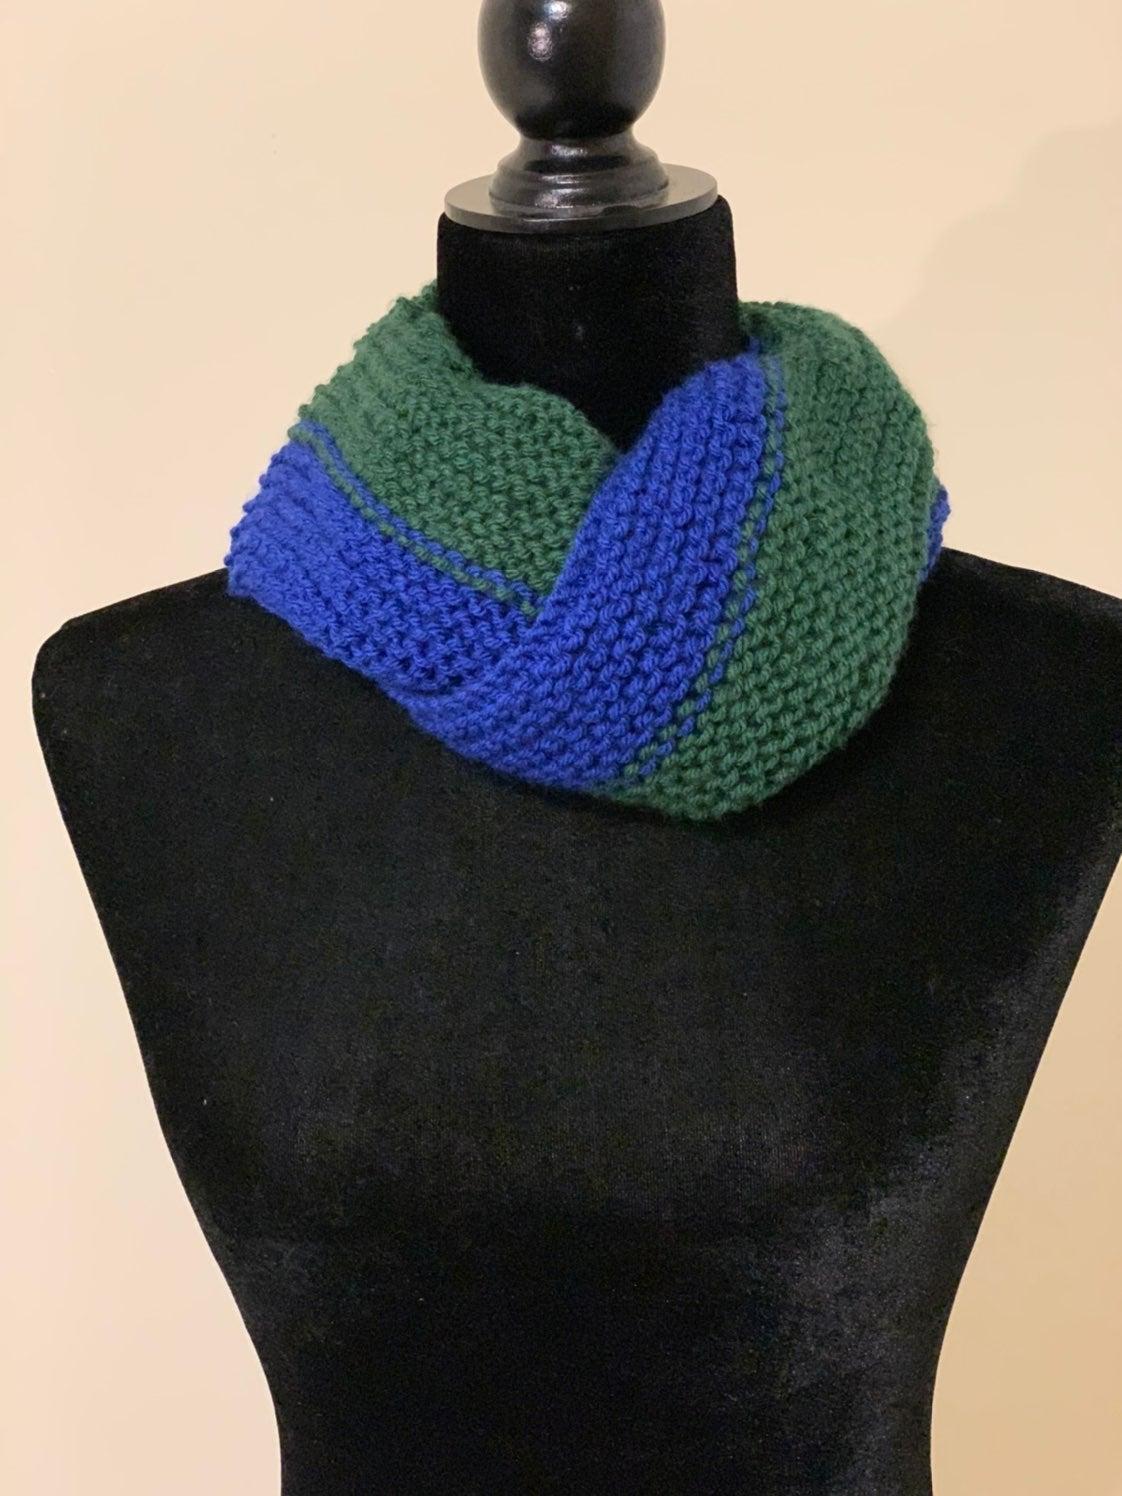 #1 - Knit, handmade, neck warmer/scarf